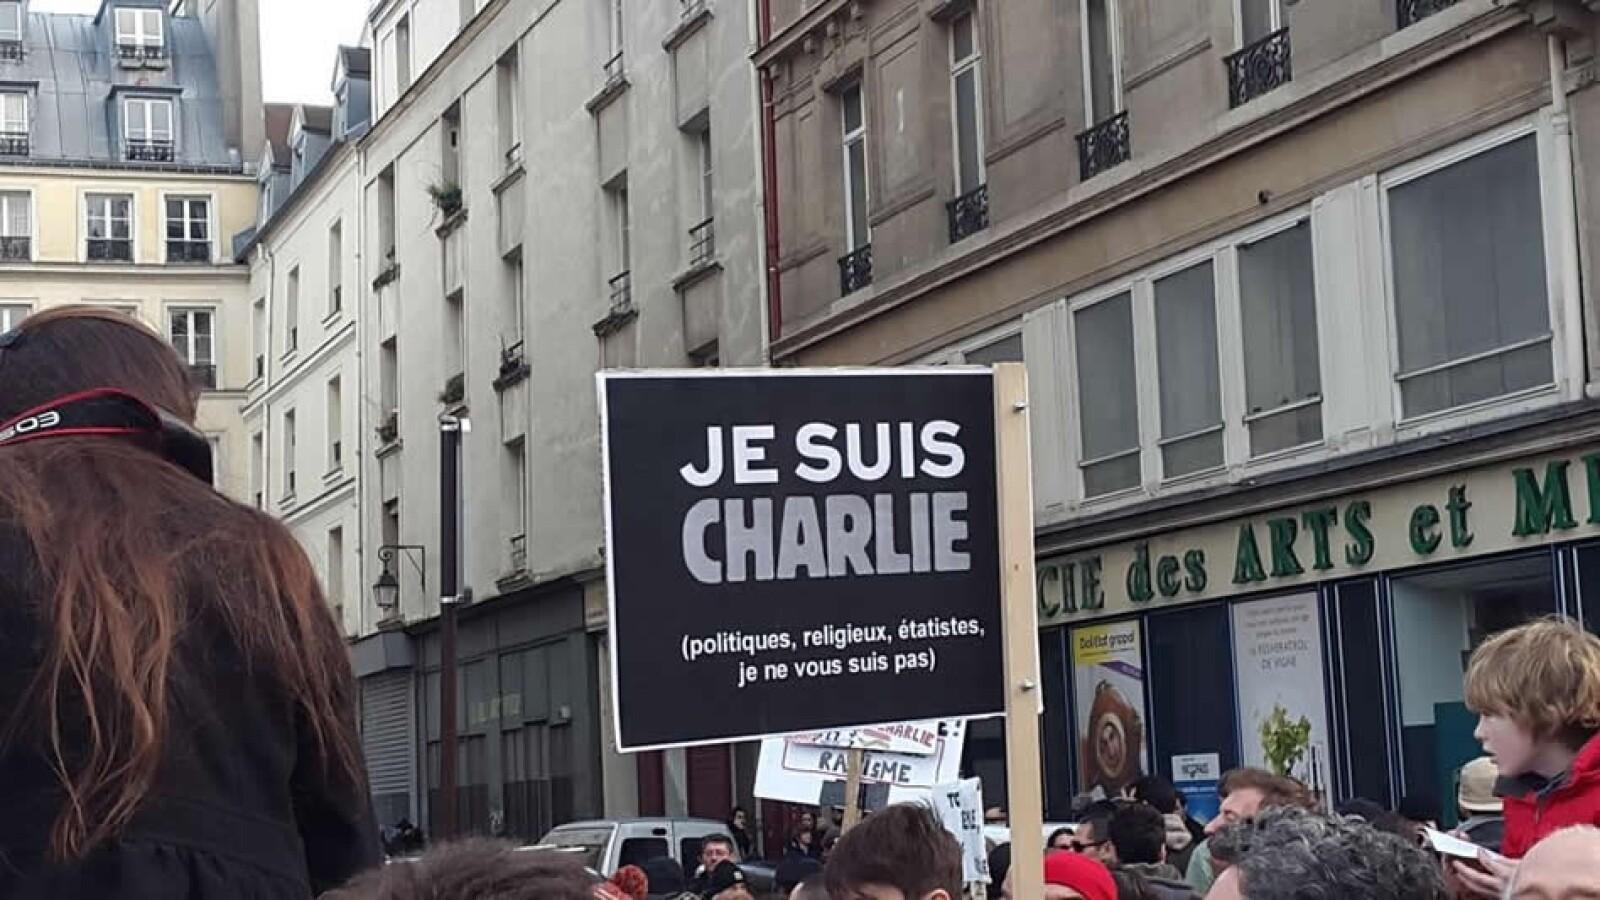 Je Suis Charles pancarta